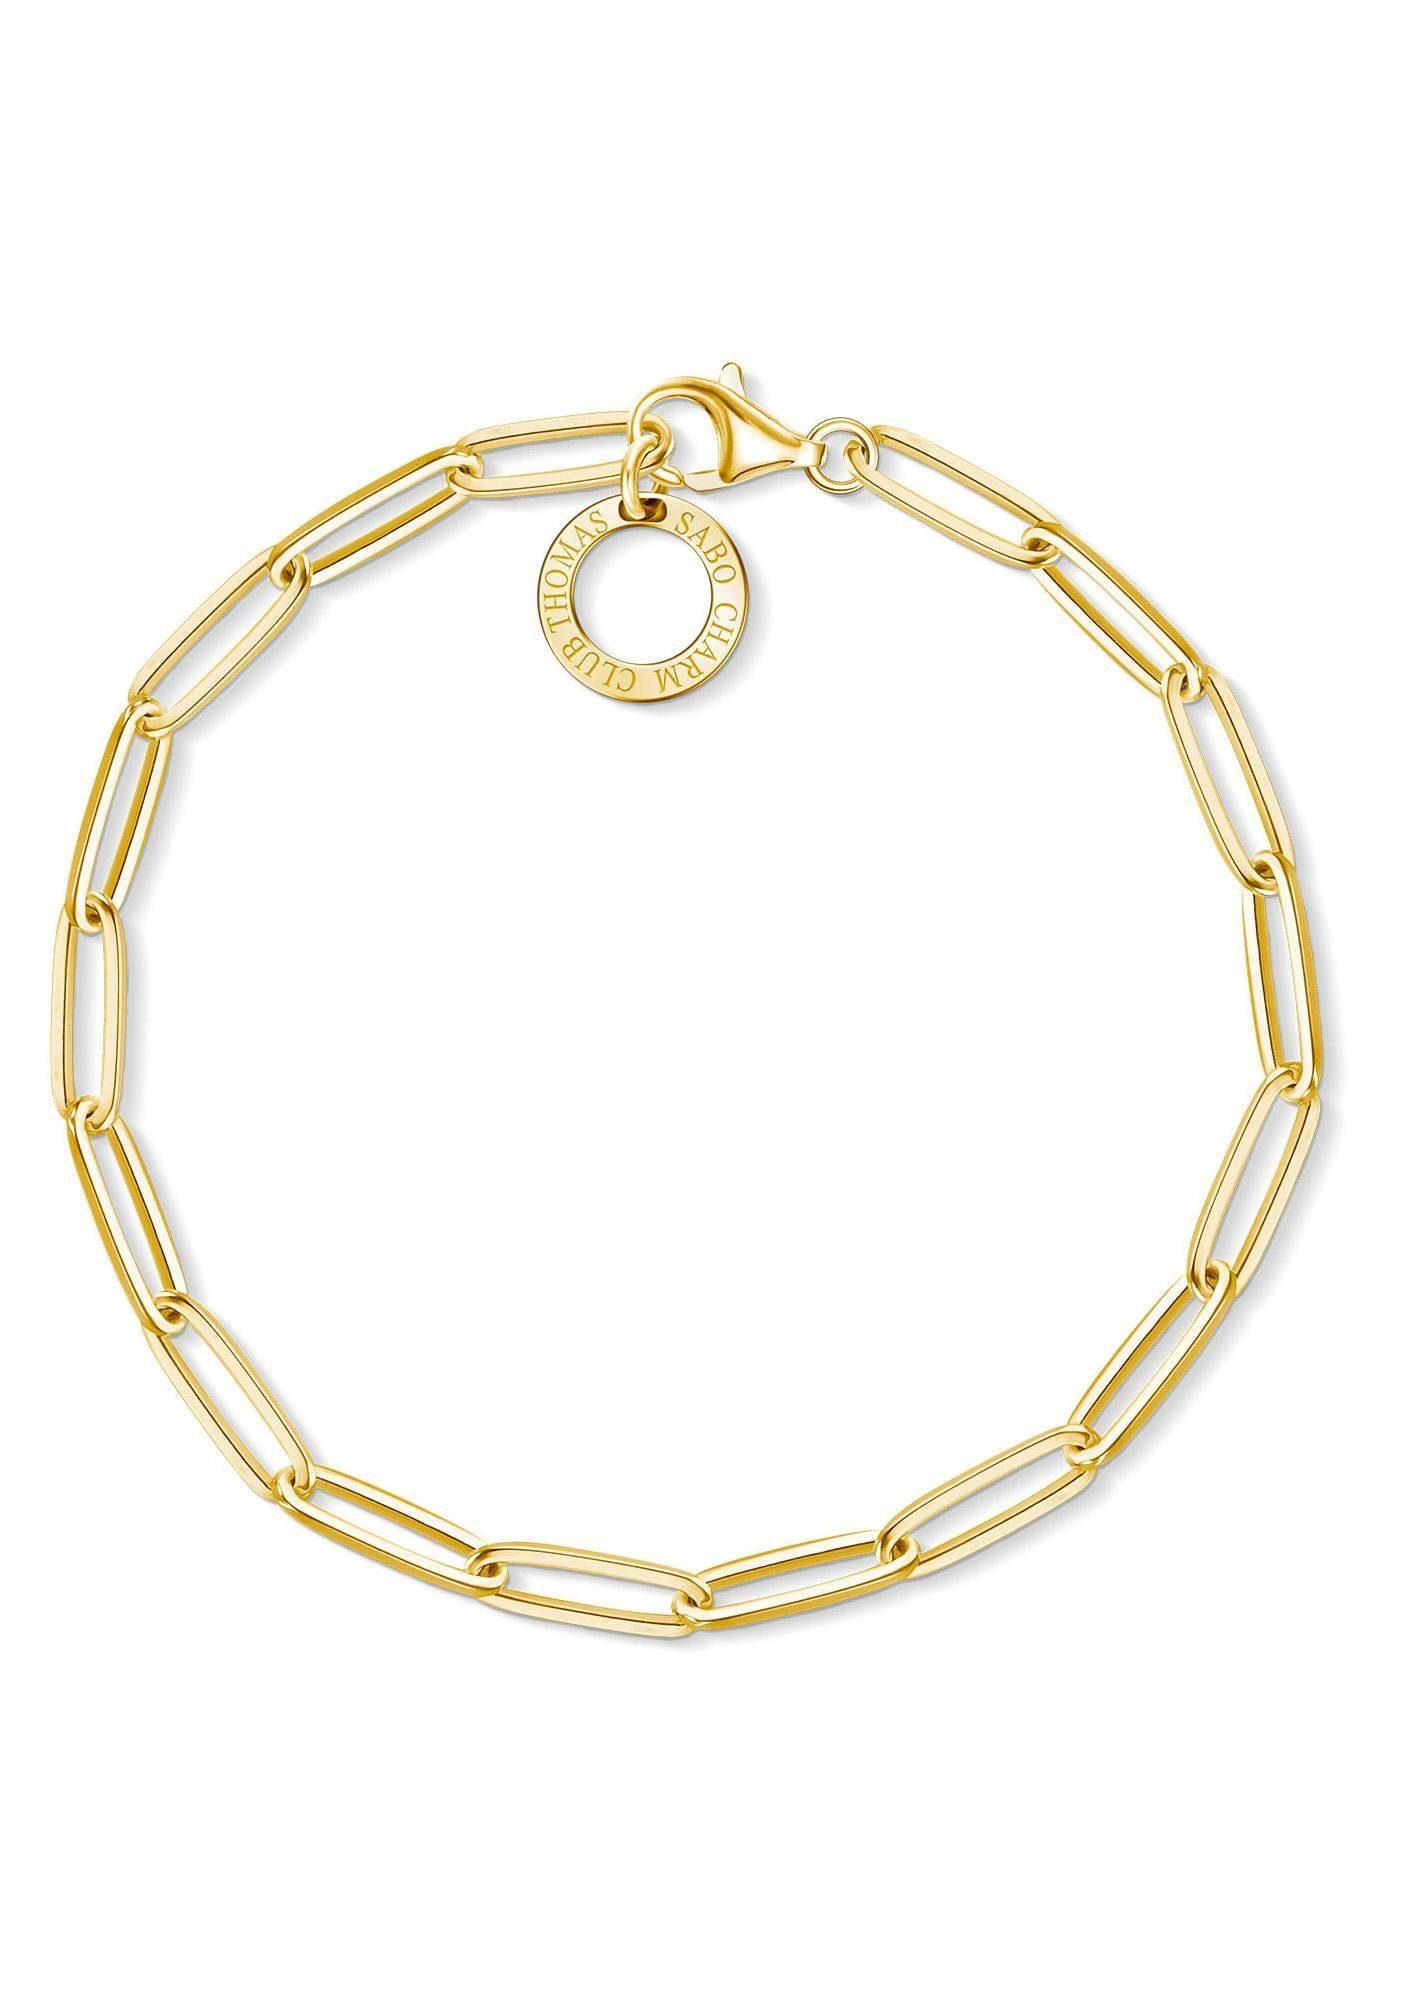 Charm 39 l15 « 5L17L18 Thomas Sabo Kaufen armband 413 Online »x0253 5 l1TKJcF